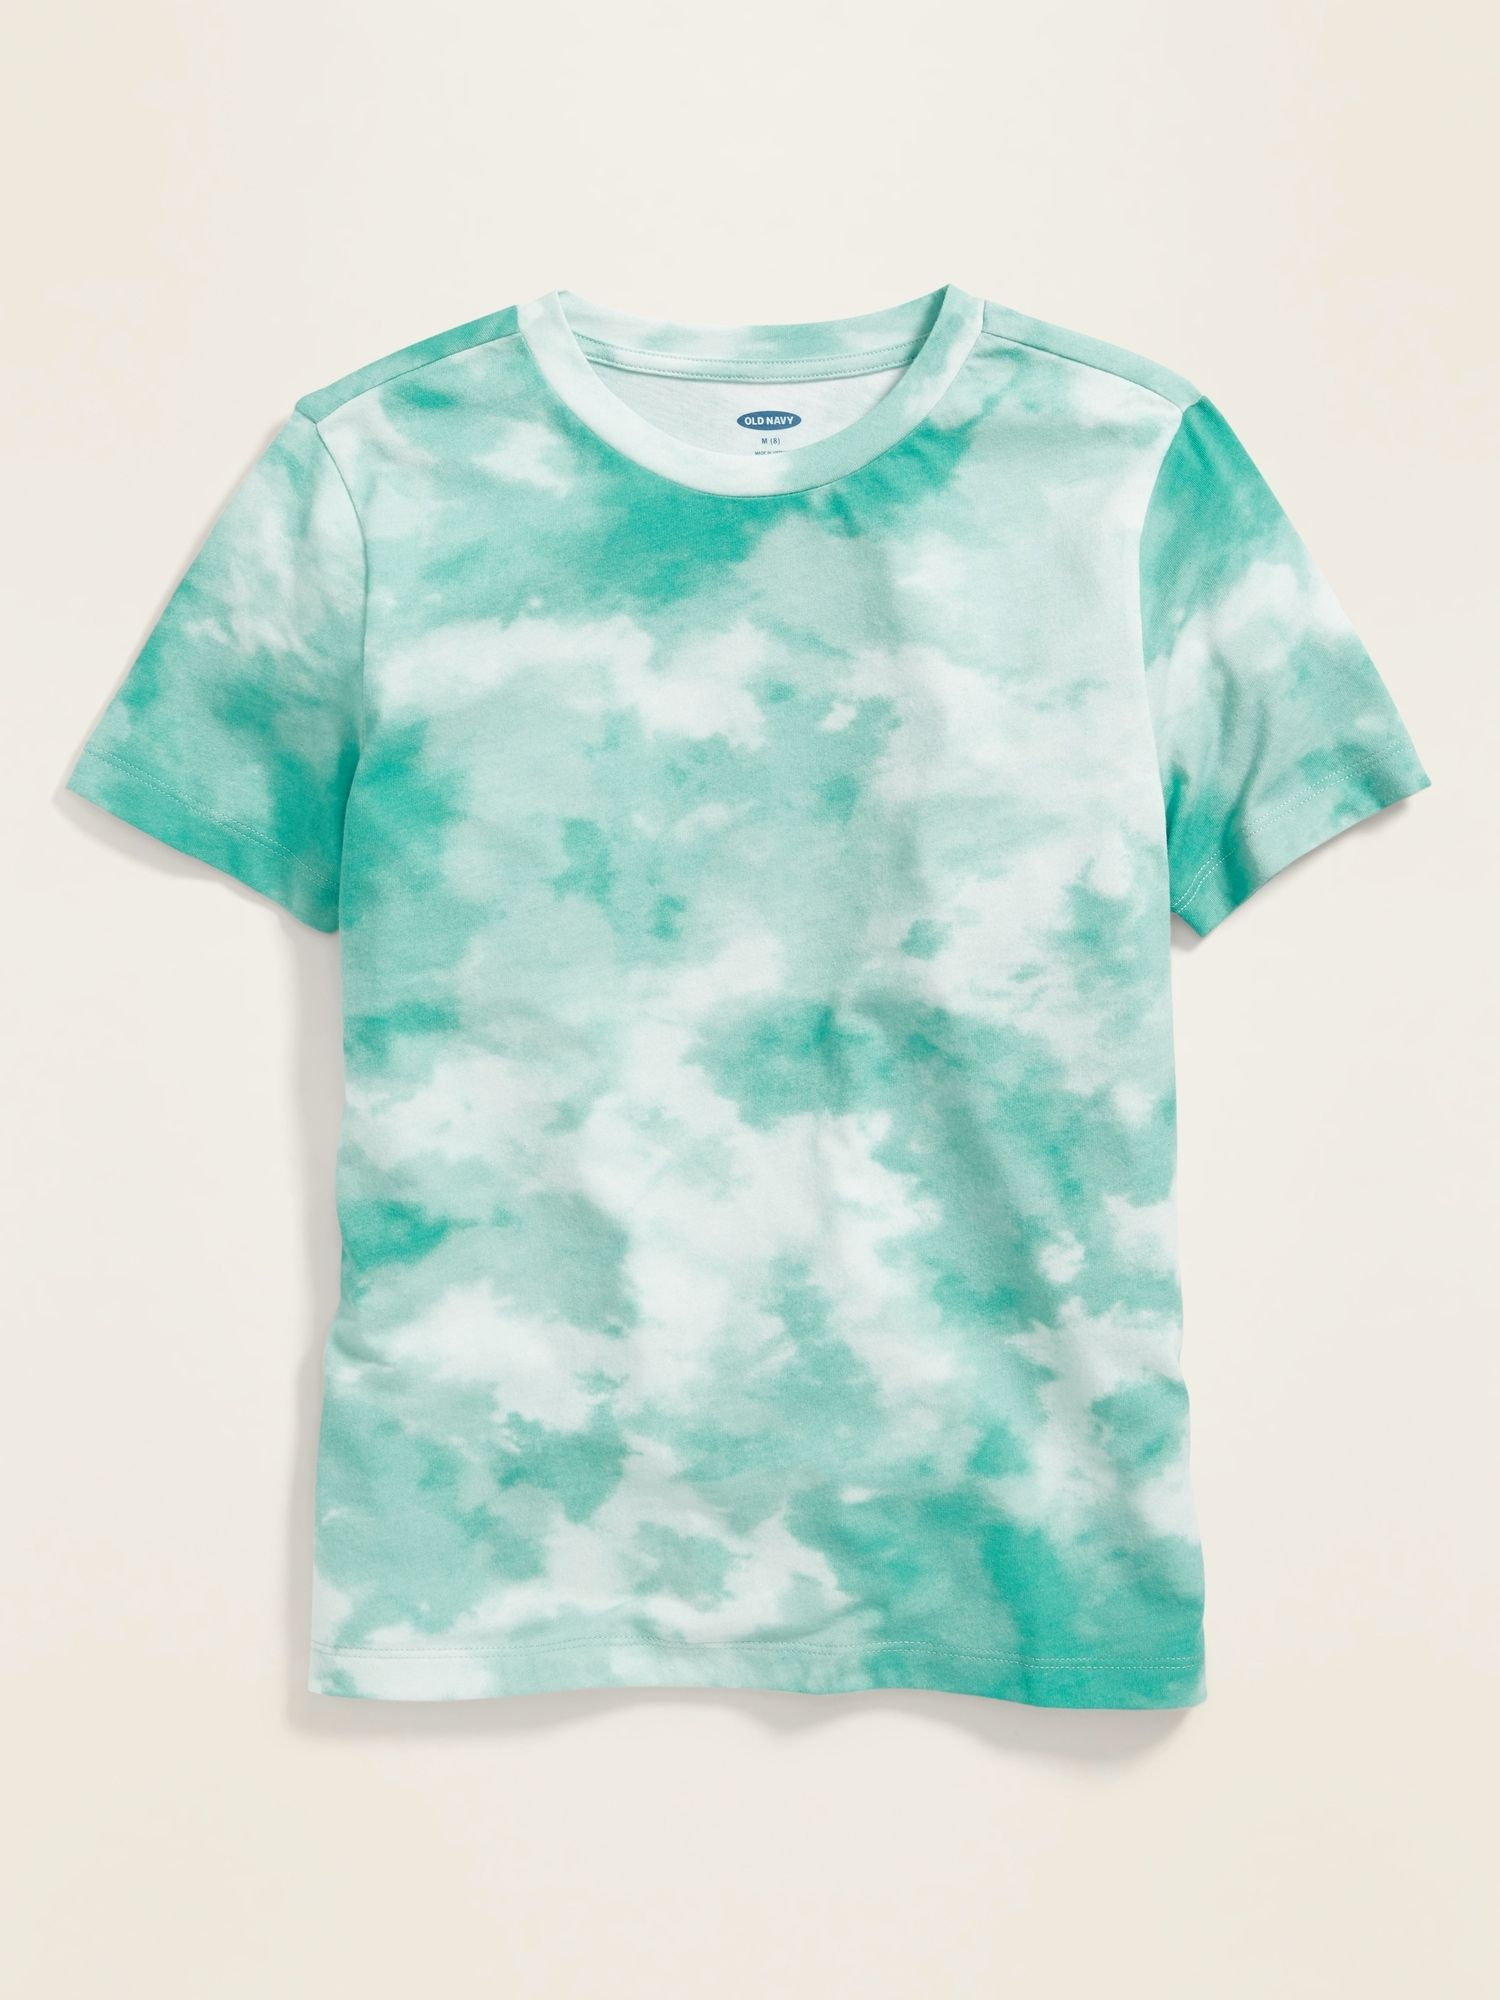 Softest Tie Dye Tee For Boys Tie Dye Tie Dye Outfits Tie Dye Shirts [ 2000 x 1500 Pixel ]